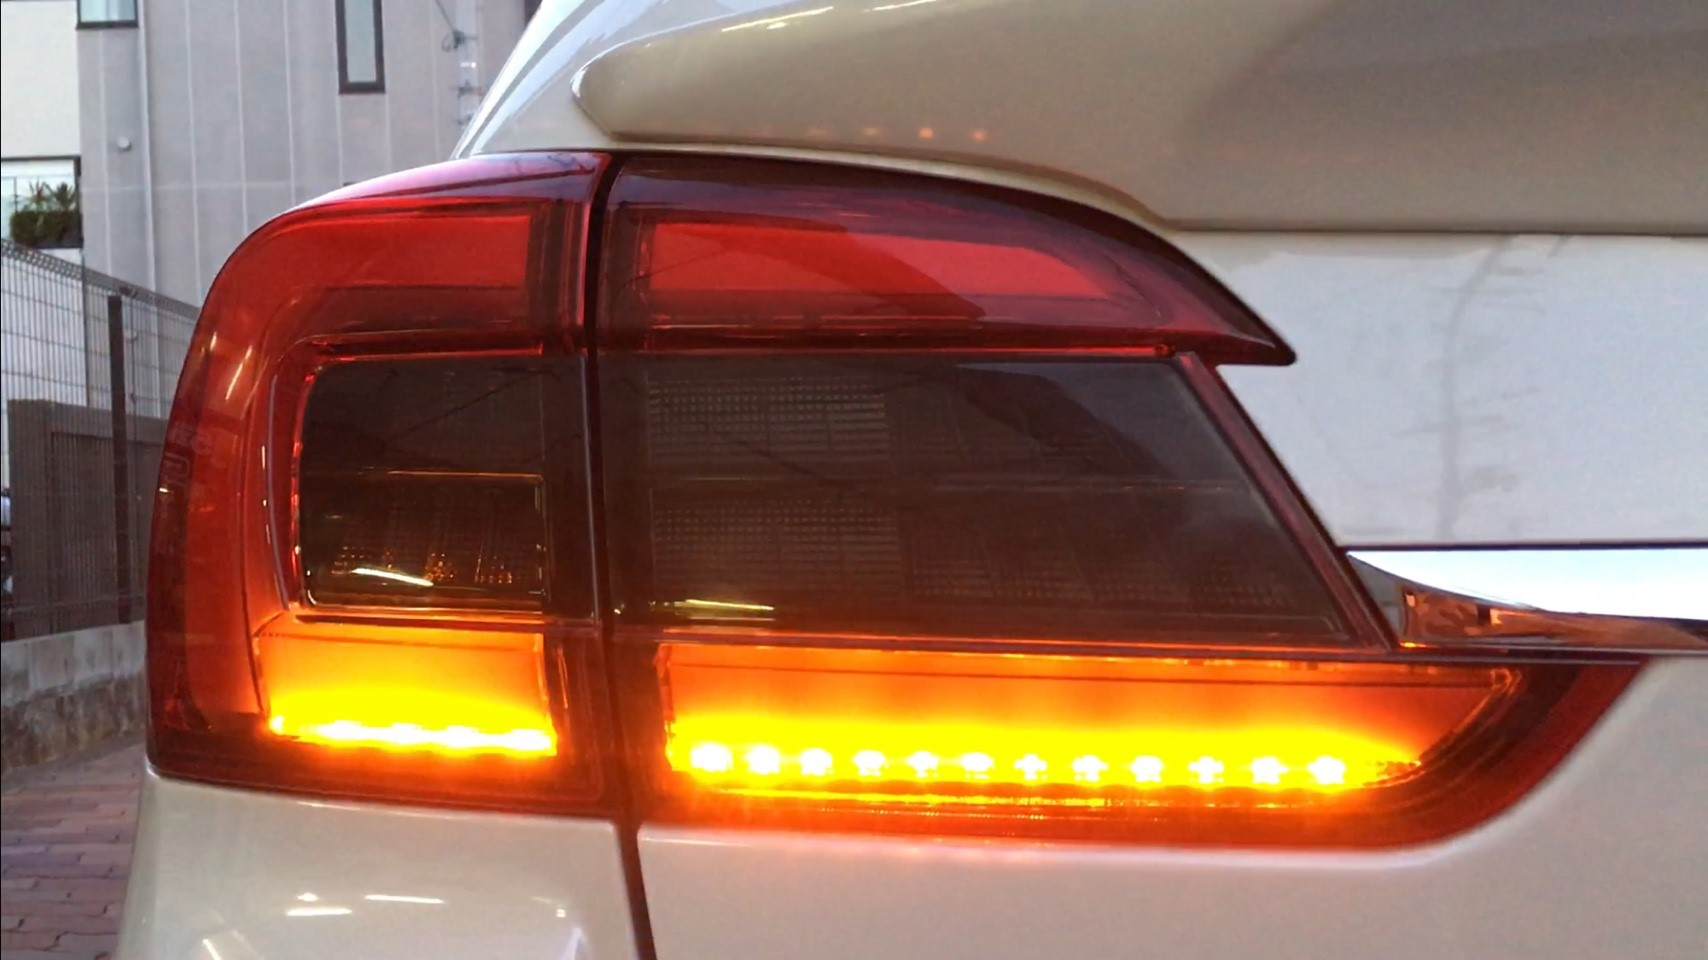 K2GEAR限定ギャラクシィ LEDテールランプ 試作品の2(プロトタイプ2)